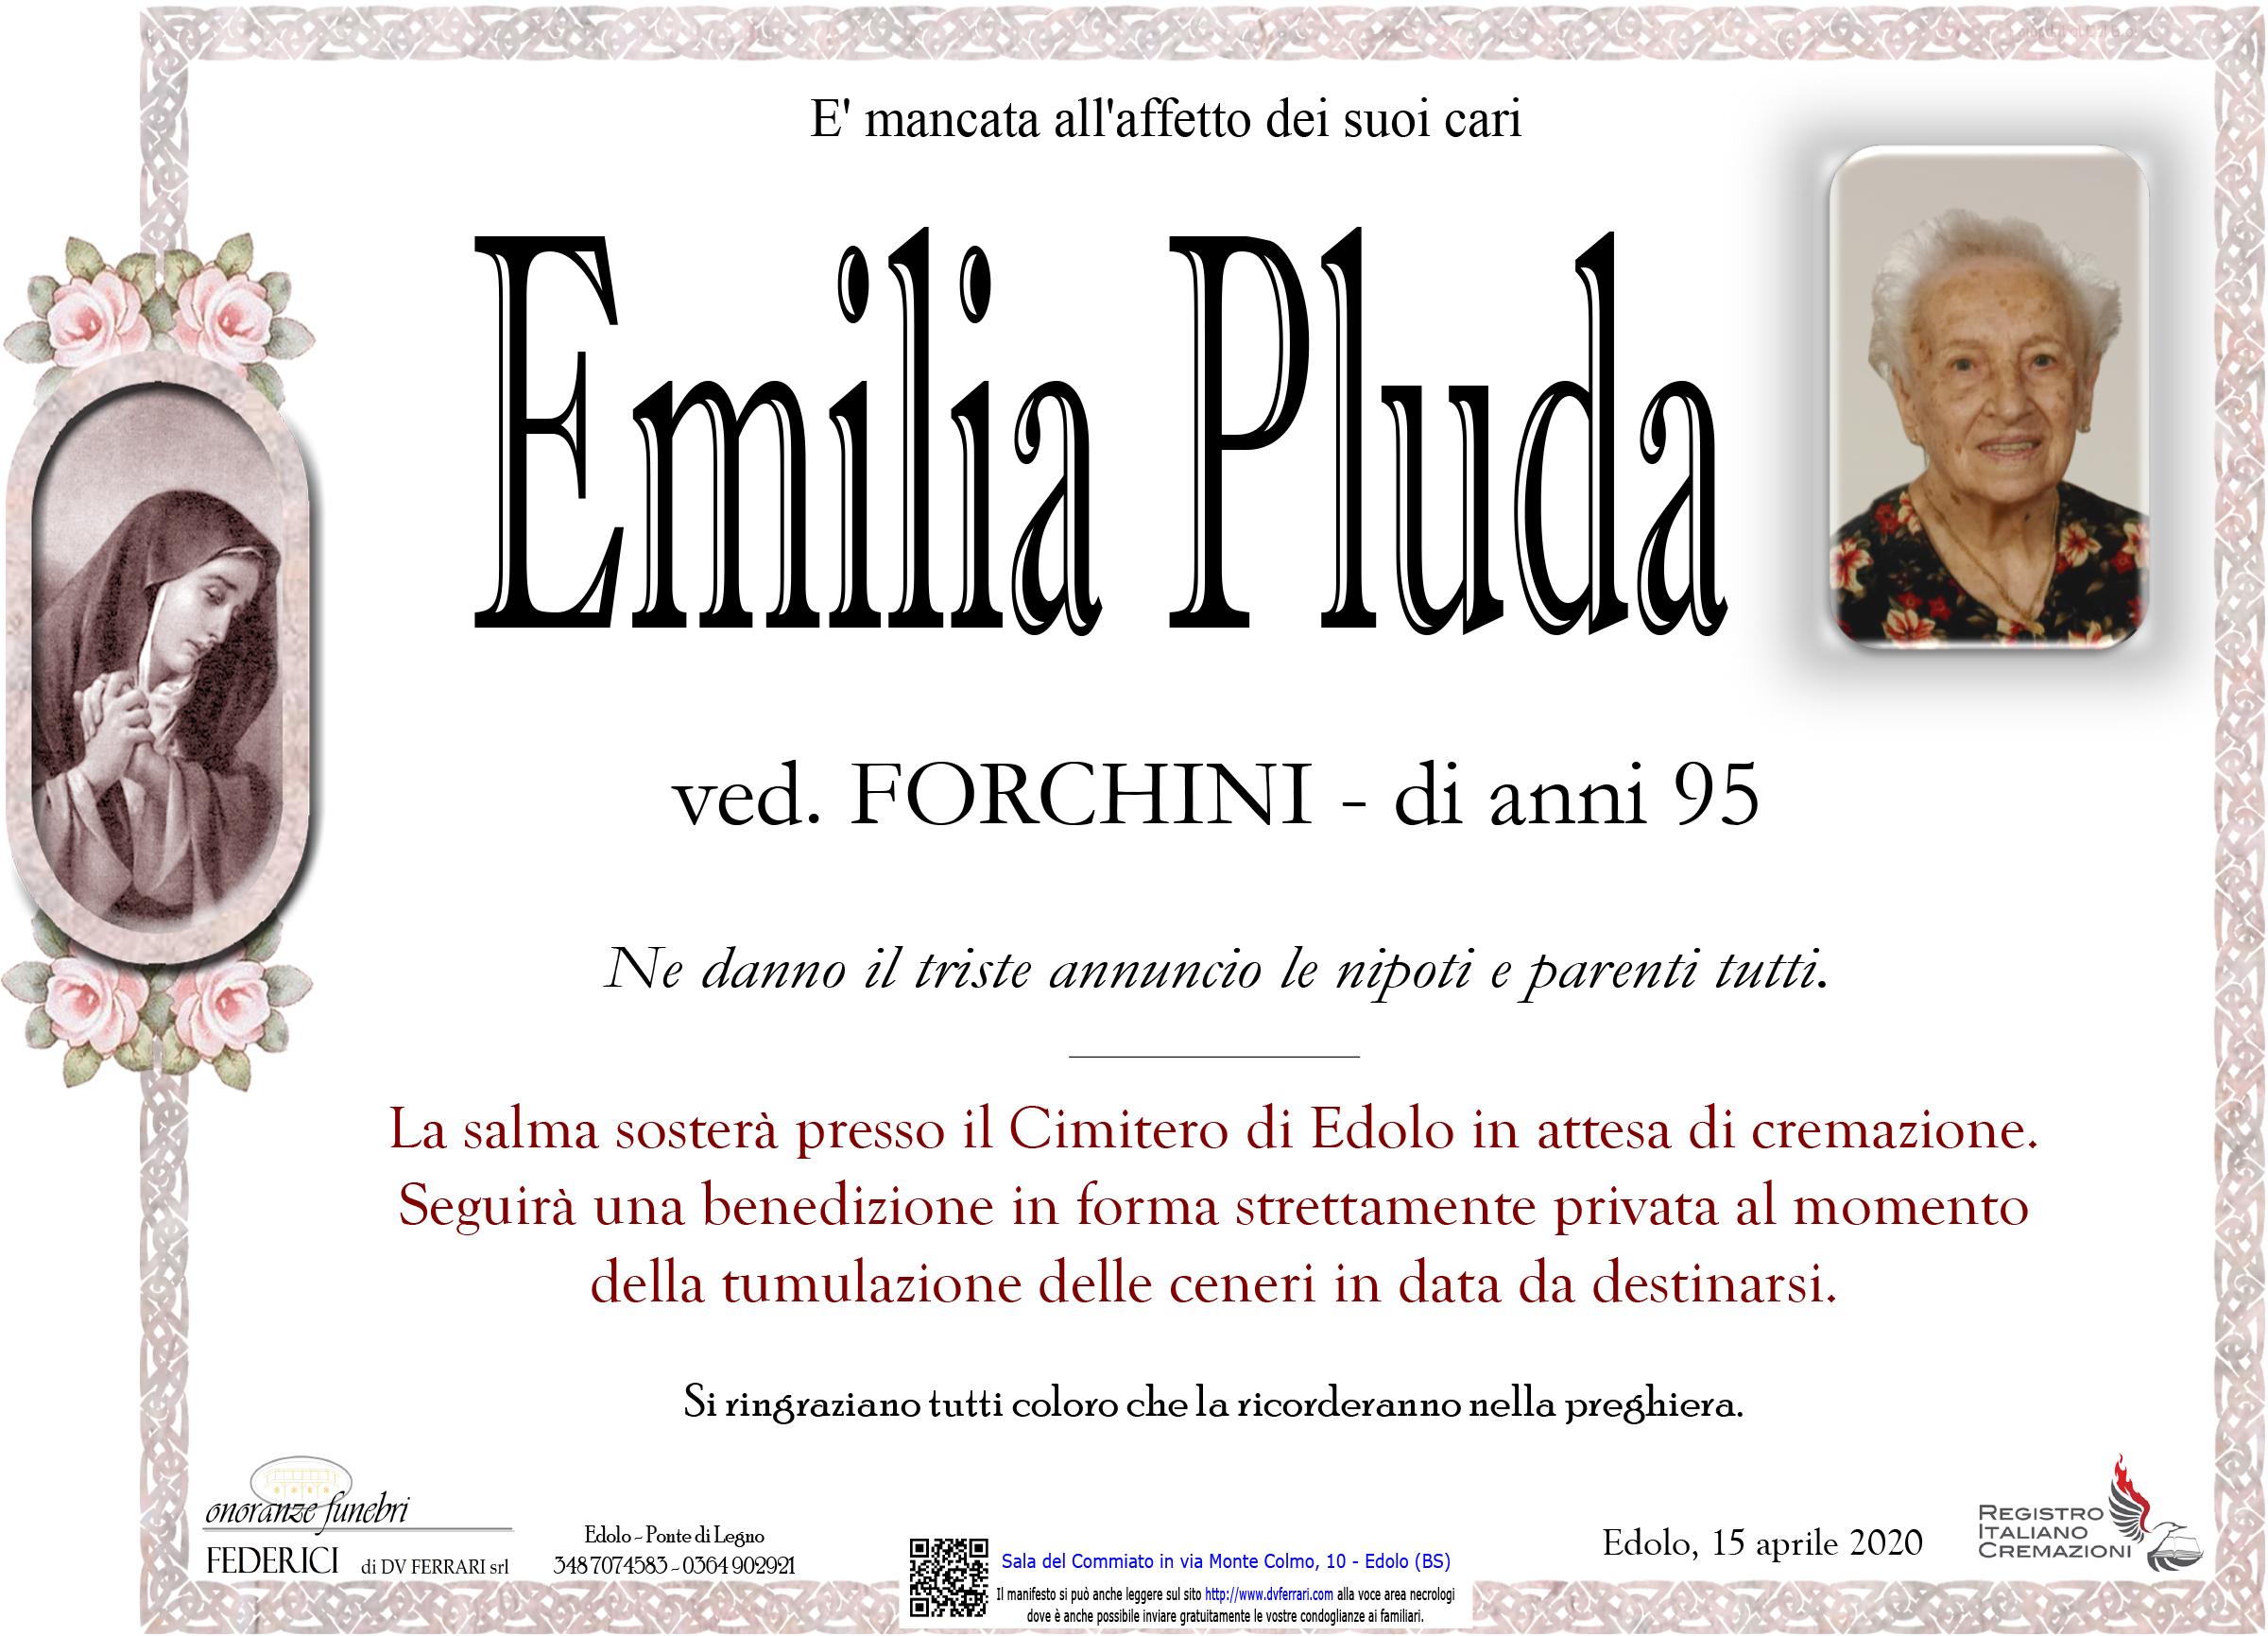 EMILIA PLUDA VED. FORCHINI - EDOLO